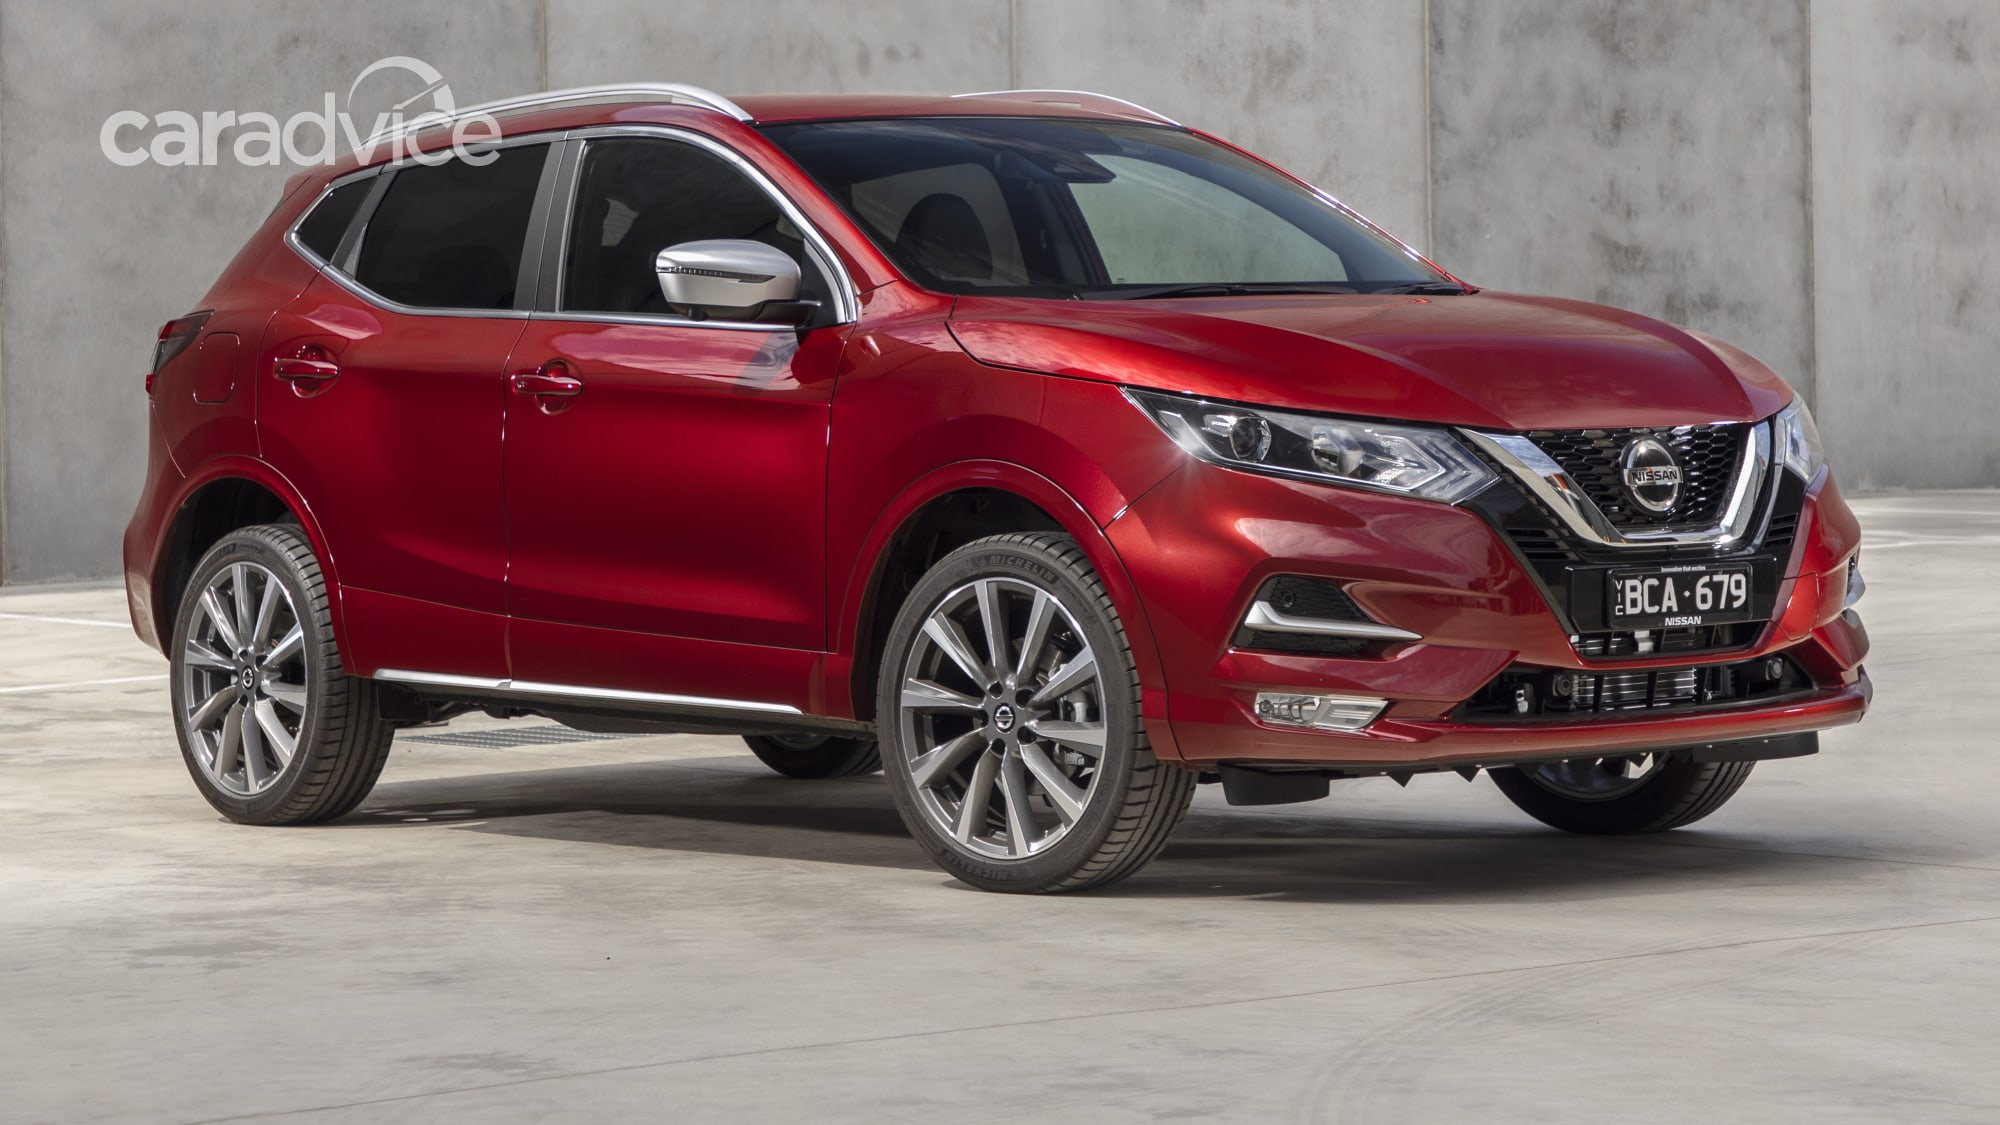 2020 nissan qashqai pricing and specs carplay new